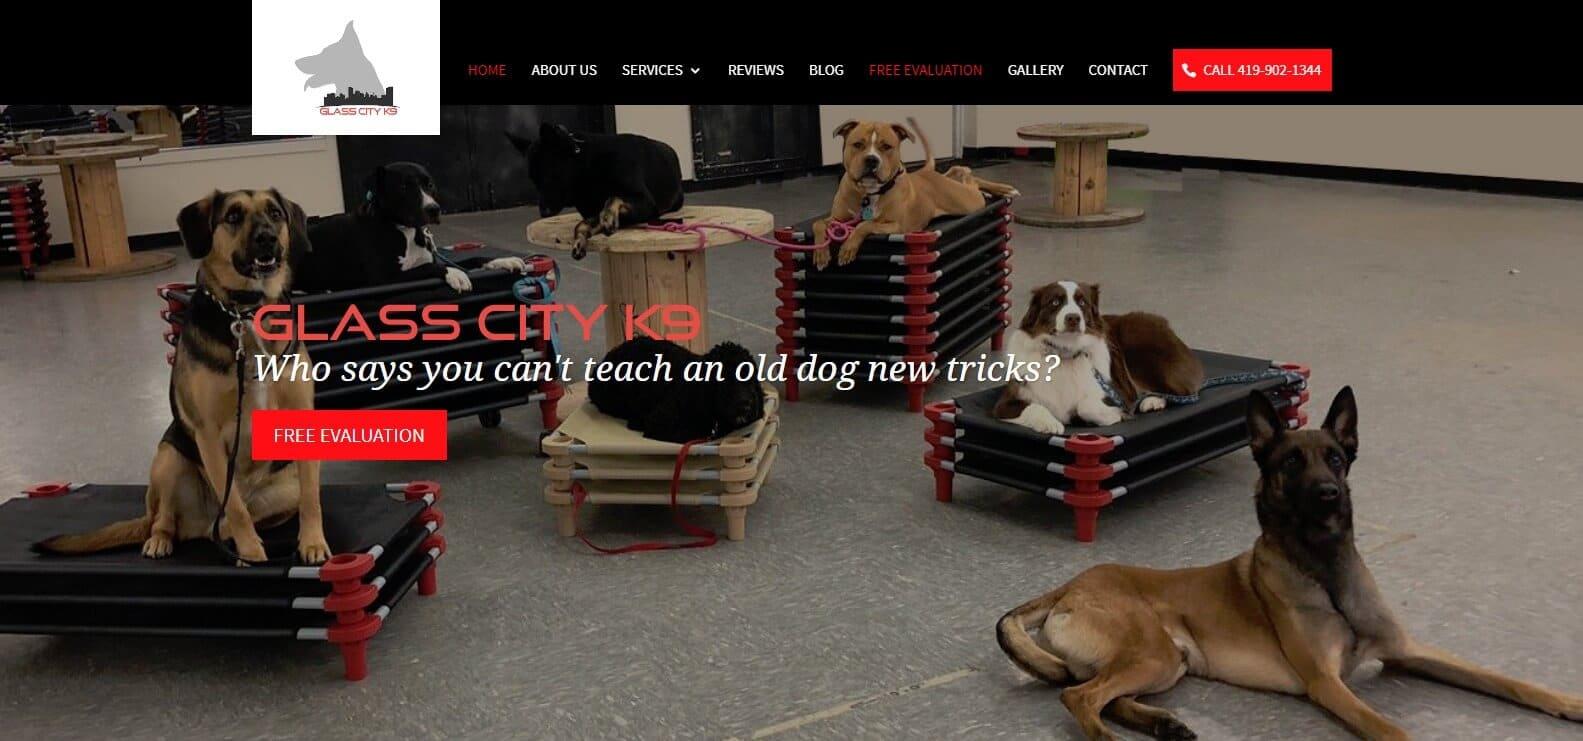 Toledo Dog Training | Puppy Training Toledo OH | Glass City